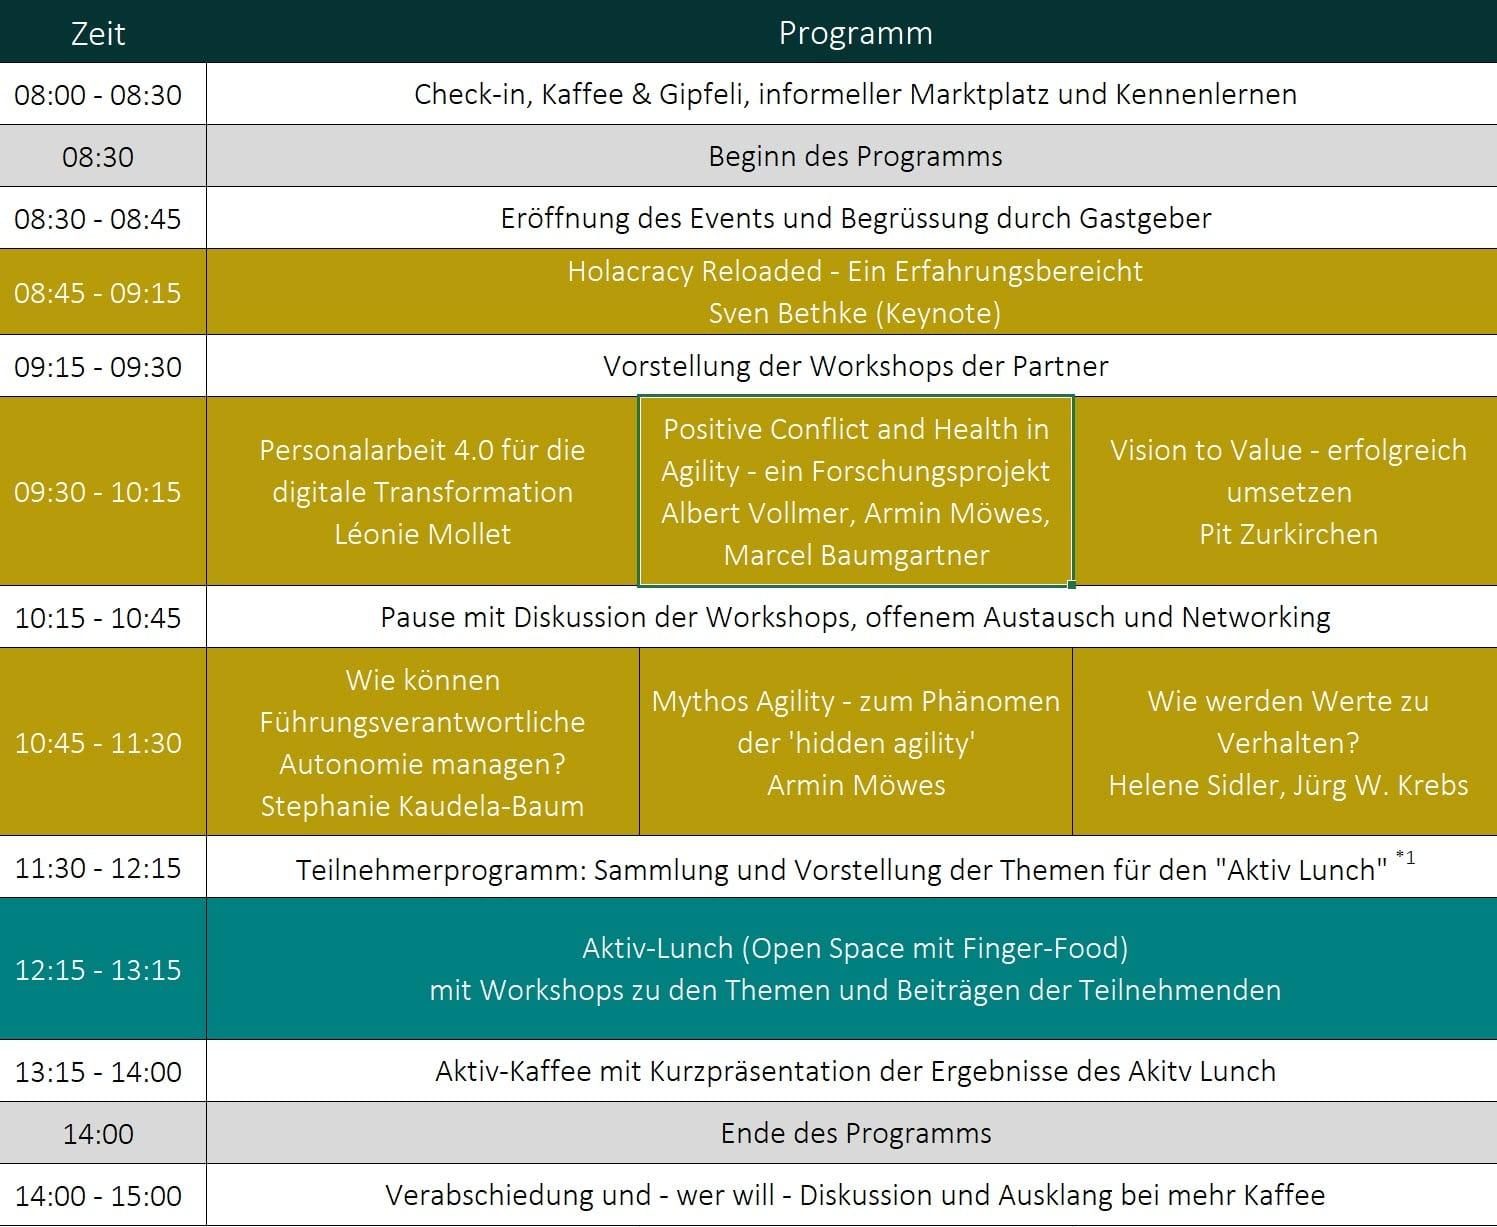 Programm agile KMU Forum Luzern